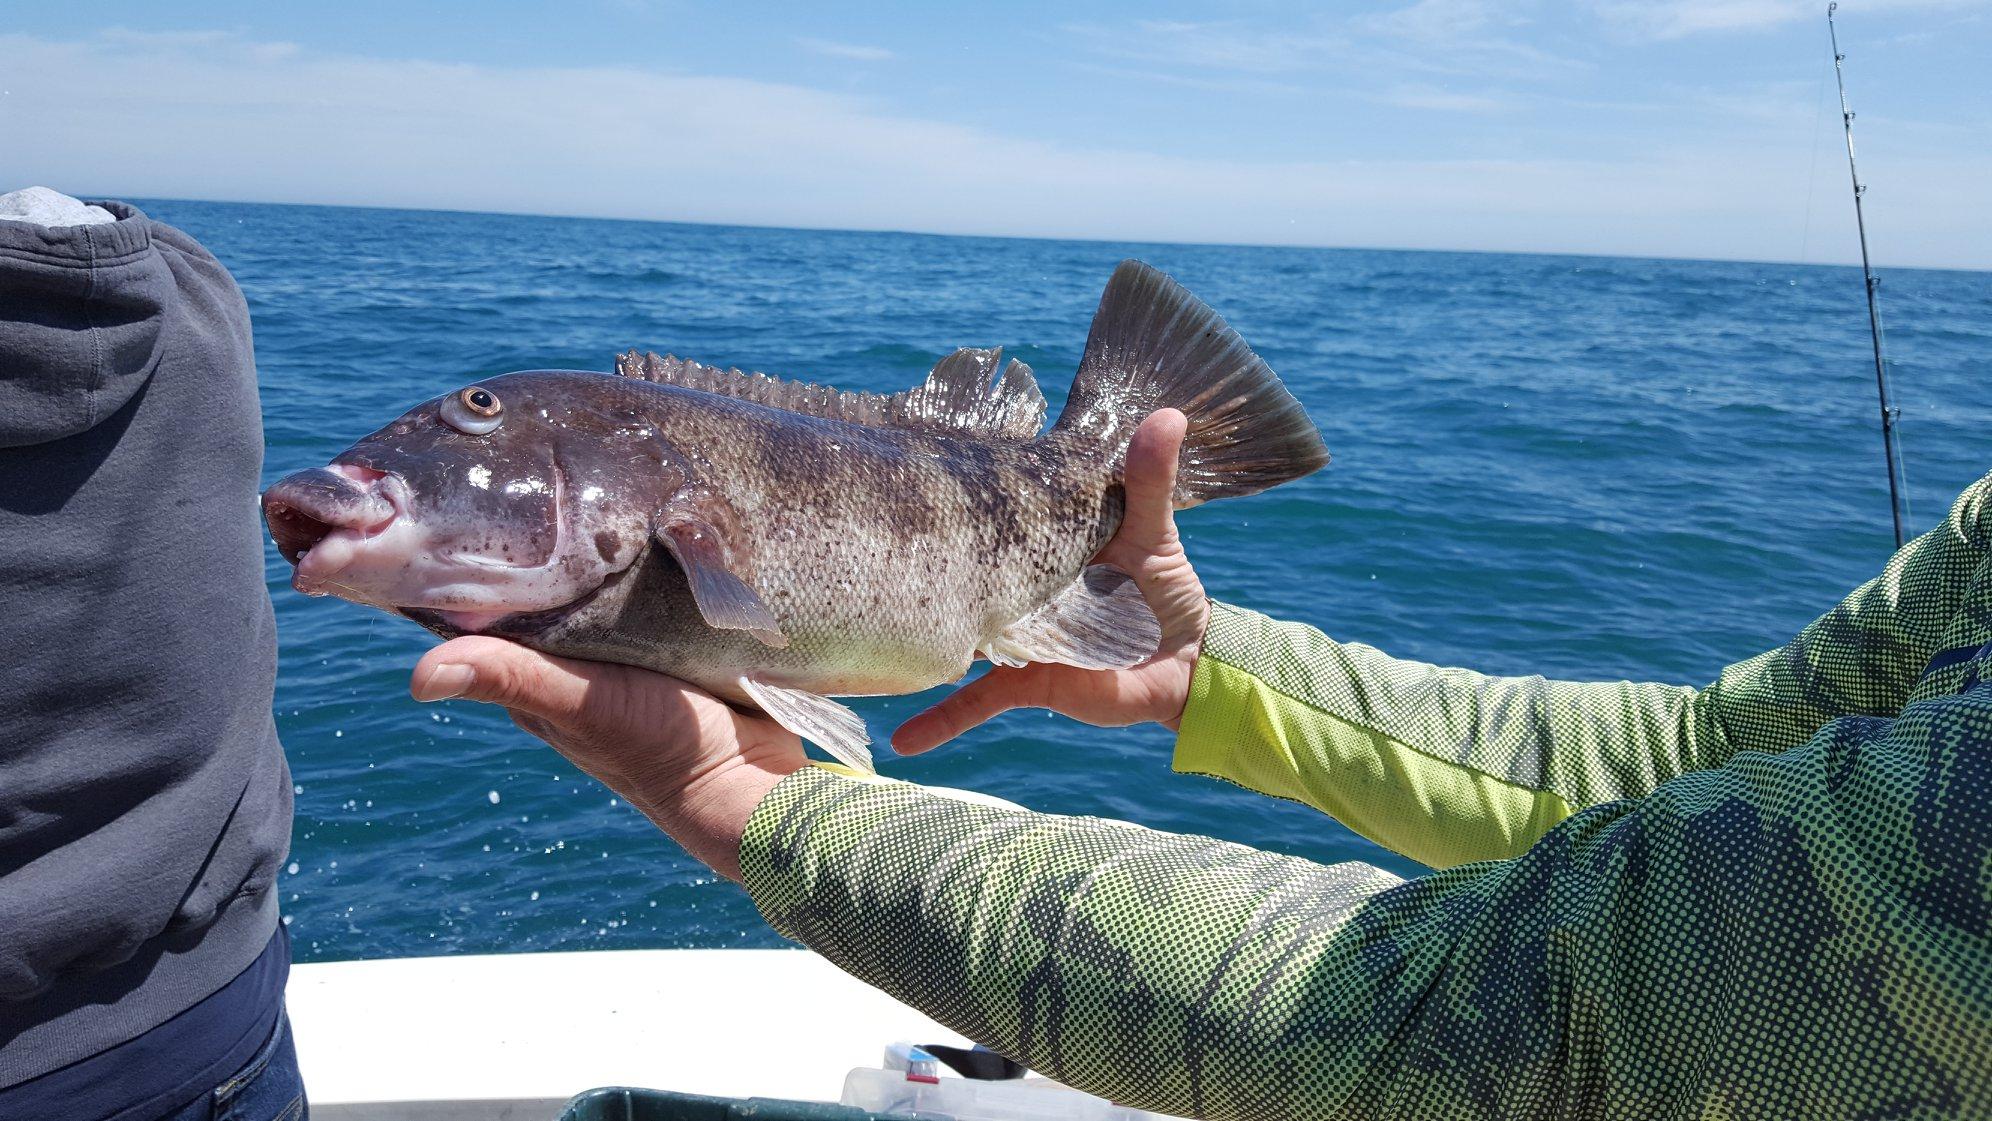 Virginia saltwater fishing report tautogs flounder for Northeast saltwater fishing reports